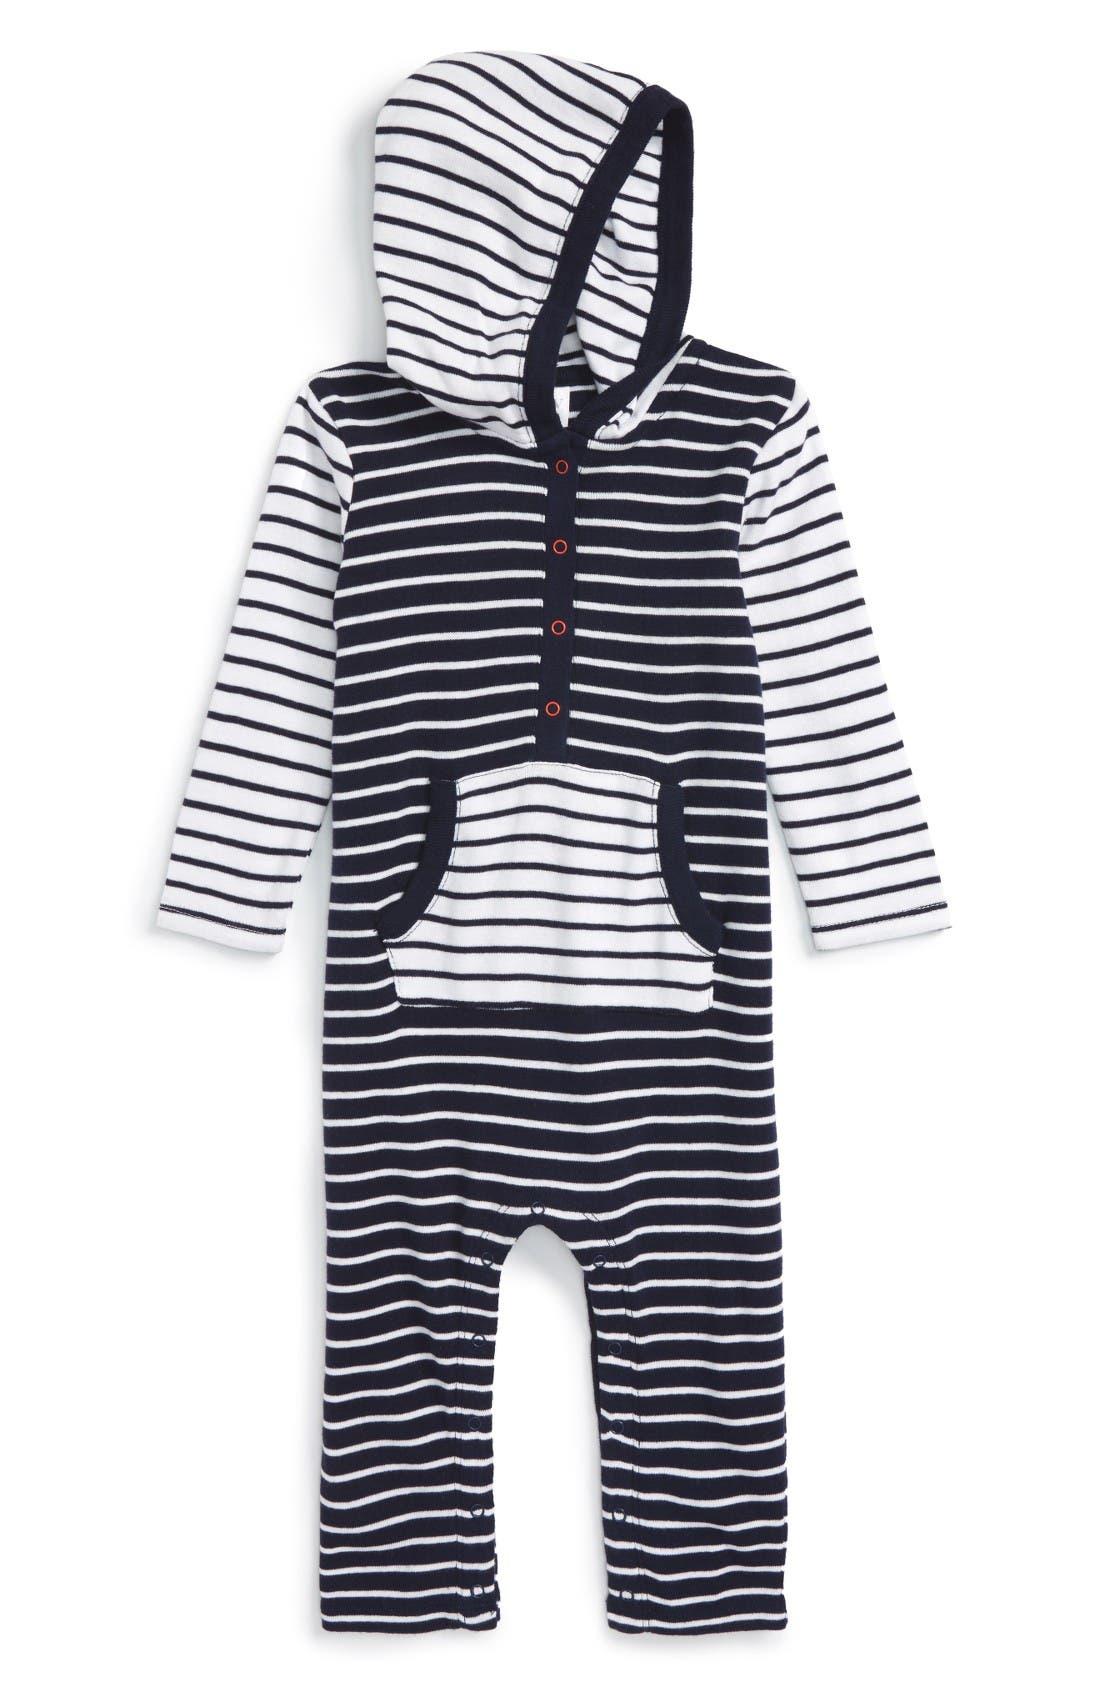 Main Image - Nordstrom Baby Hooded Romper (Baby)